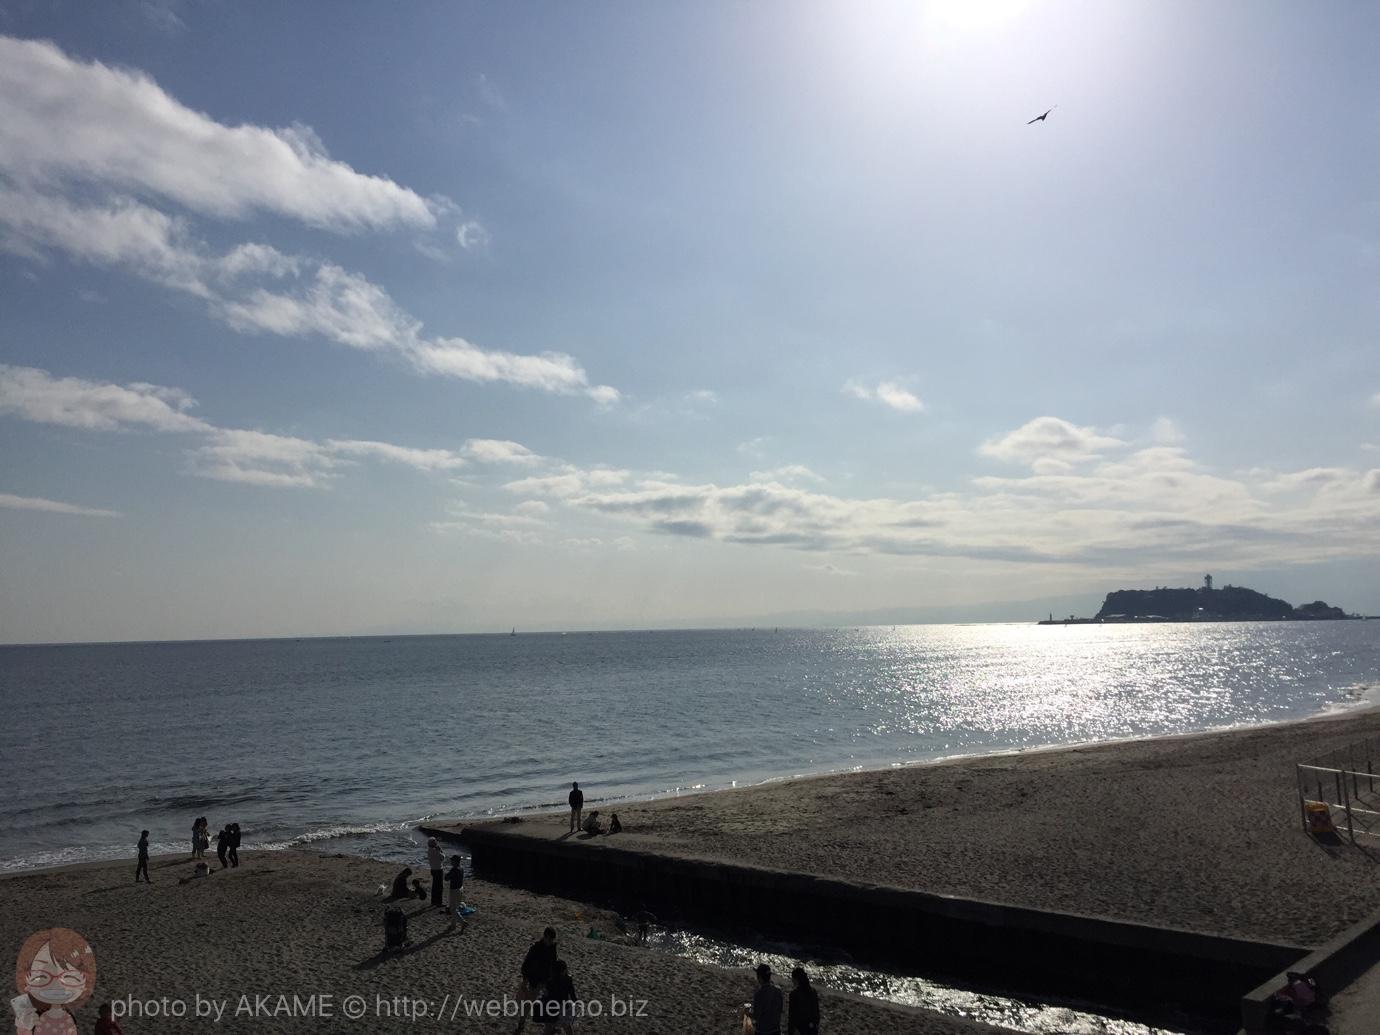 bills 七里ヶ浜店の目の前の海の景色